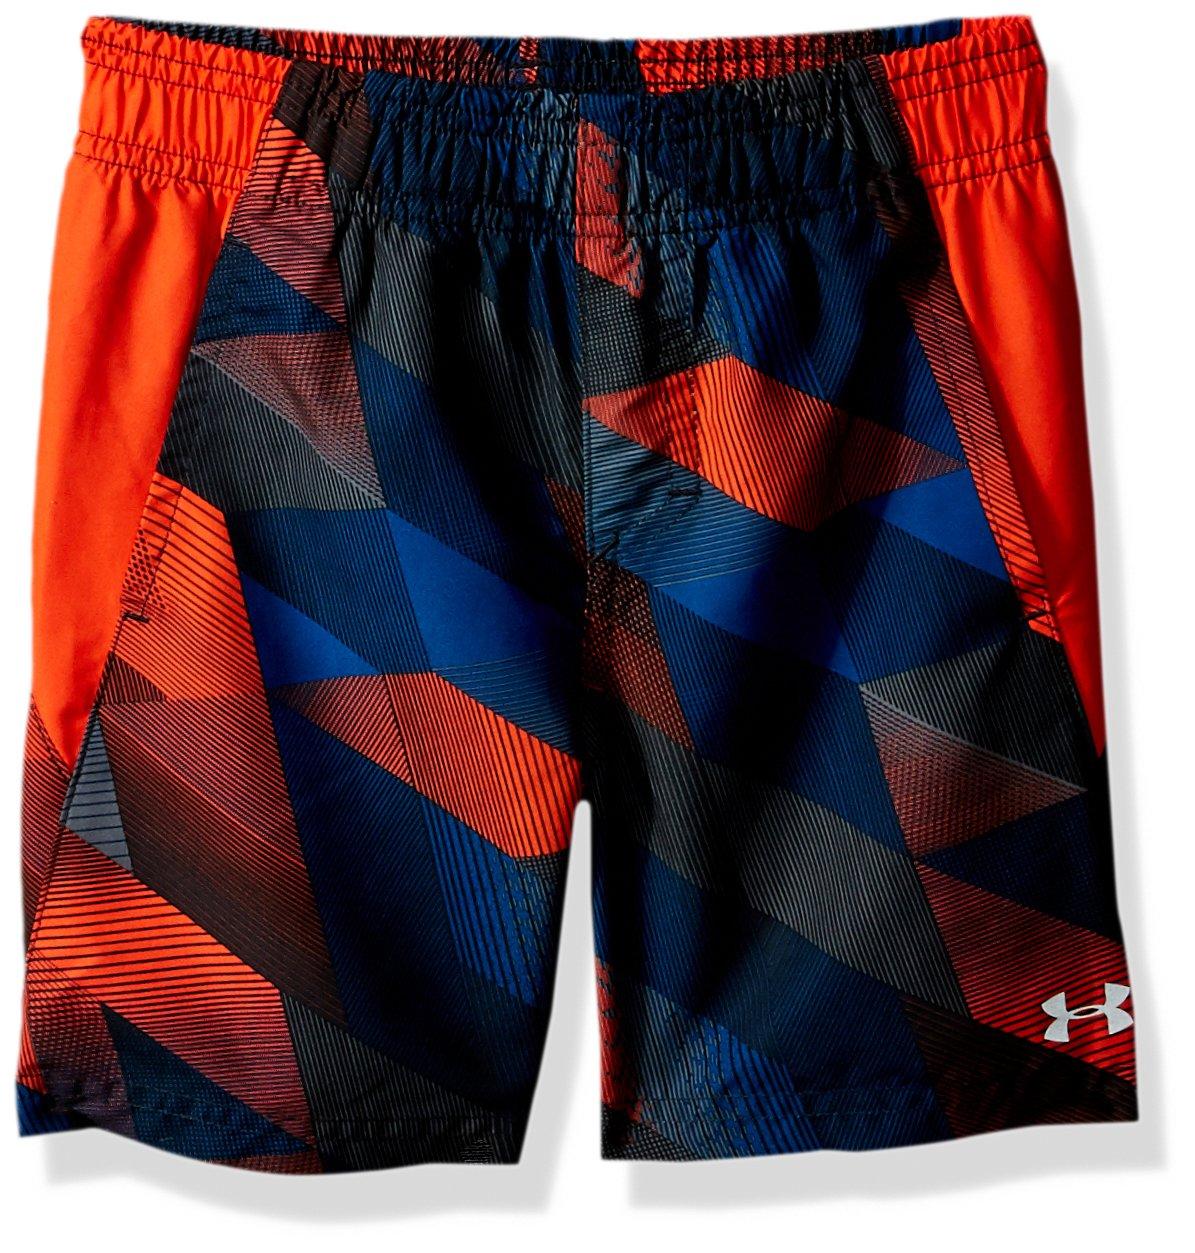 Under Armour Boys' Big Volley Fashion Swim Short, Volcano Orange, Large